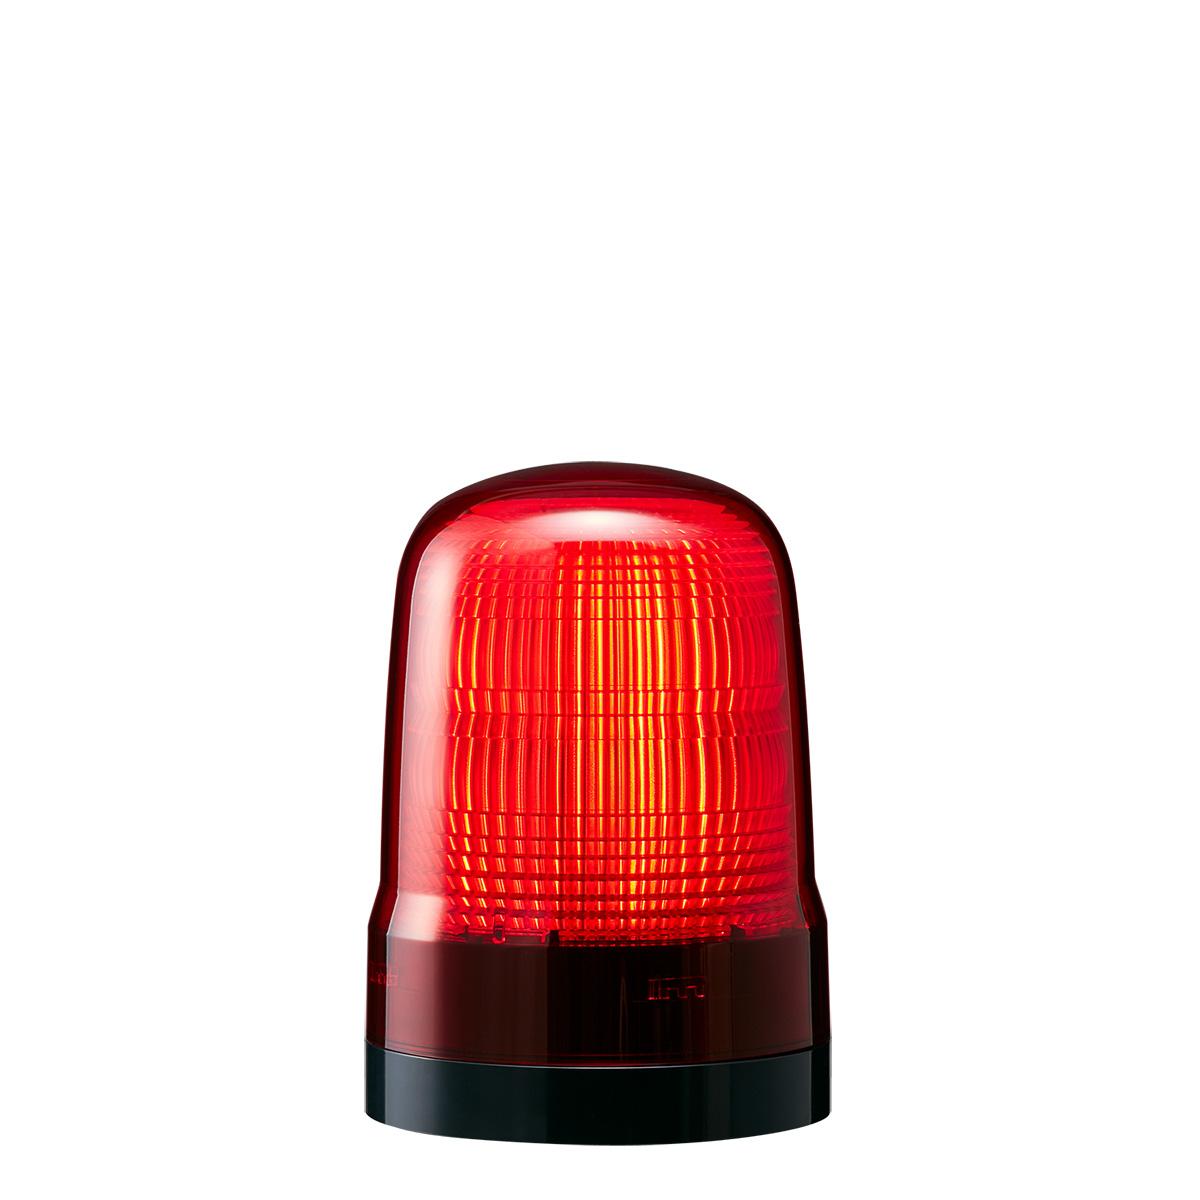 <title>送料無料 点灯 付与 点滅 フラッシュのシンプル報知 赤色灯 パトライト LED表示灯 SL DC12~24V 2.9W φ100mm レッド 赤色 プッシュイン端子台 2点穴取付 SL10-M1KTN-R</title>